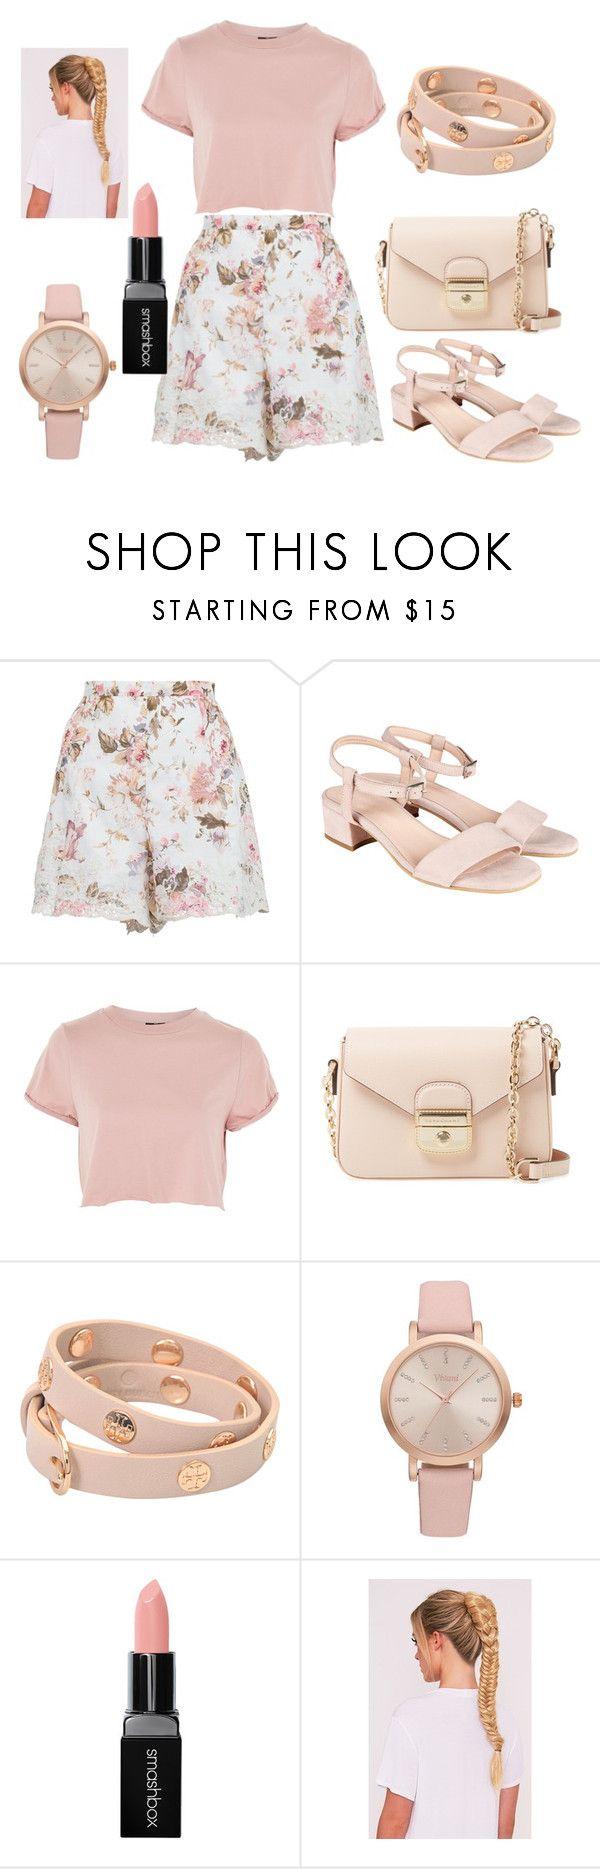 """Flower and Pink"" by zeynepkilic889 on Polyvore featuring moda, Zimmermann, Topshop, Longchamp, Tory Burch, Vivani ve Smashbox"